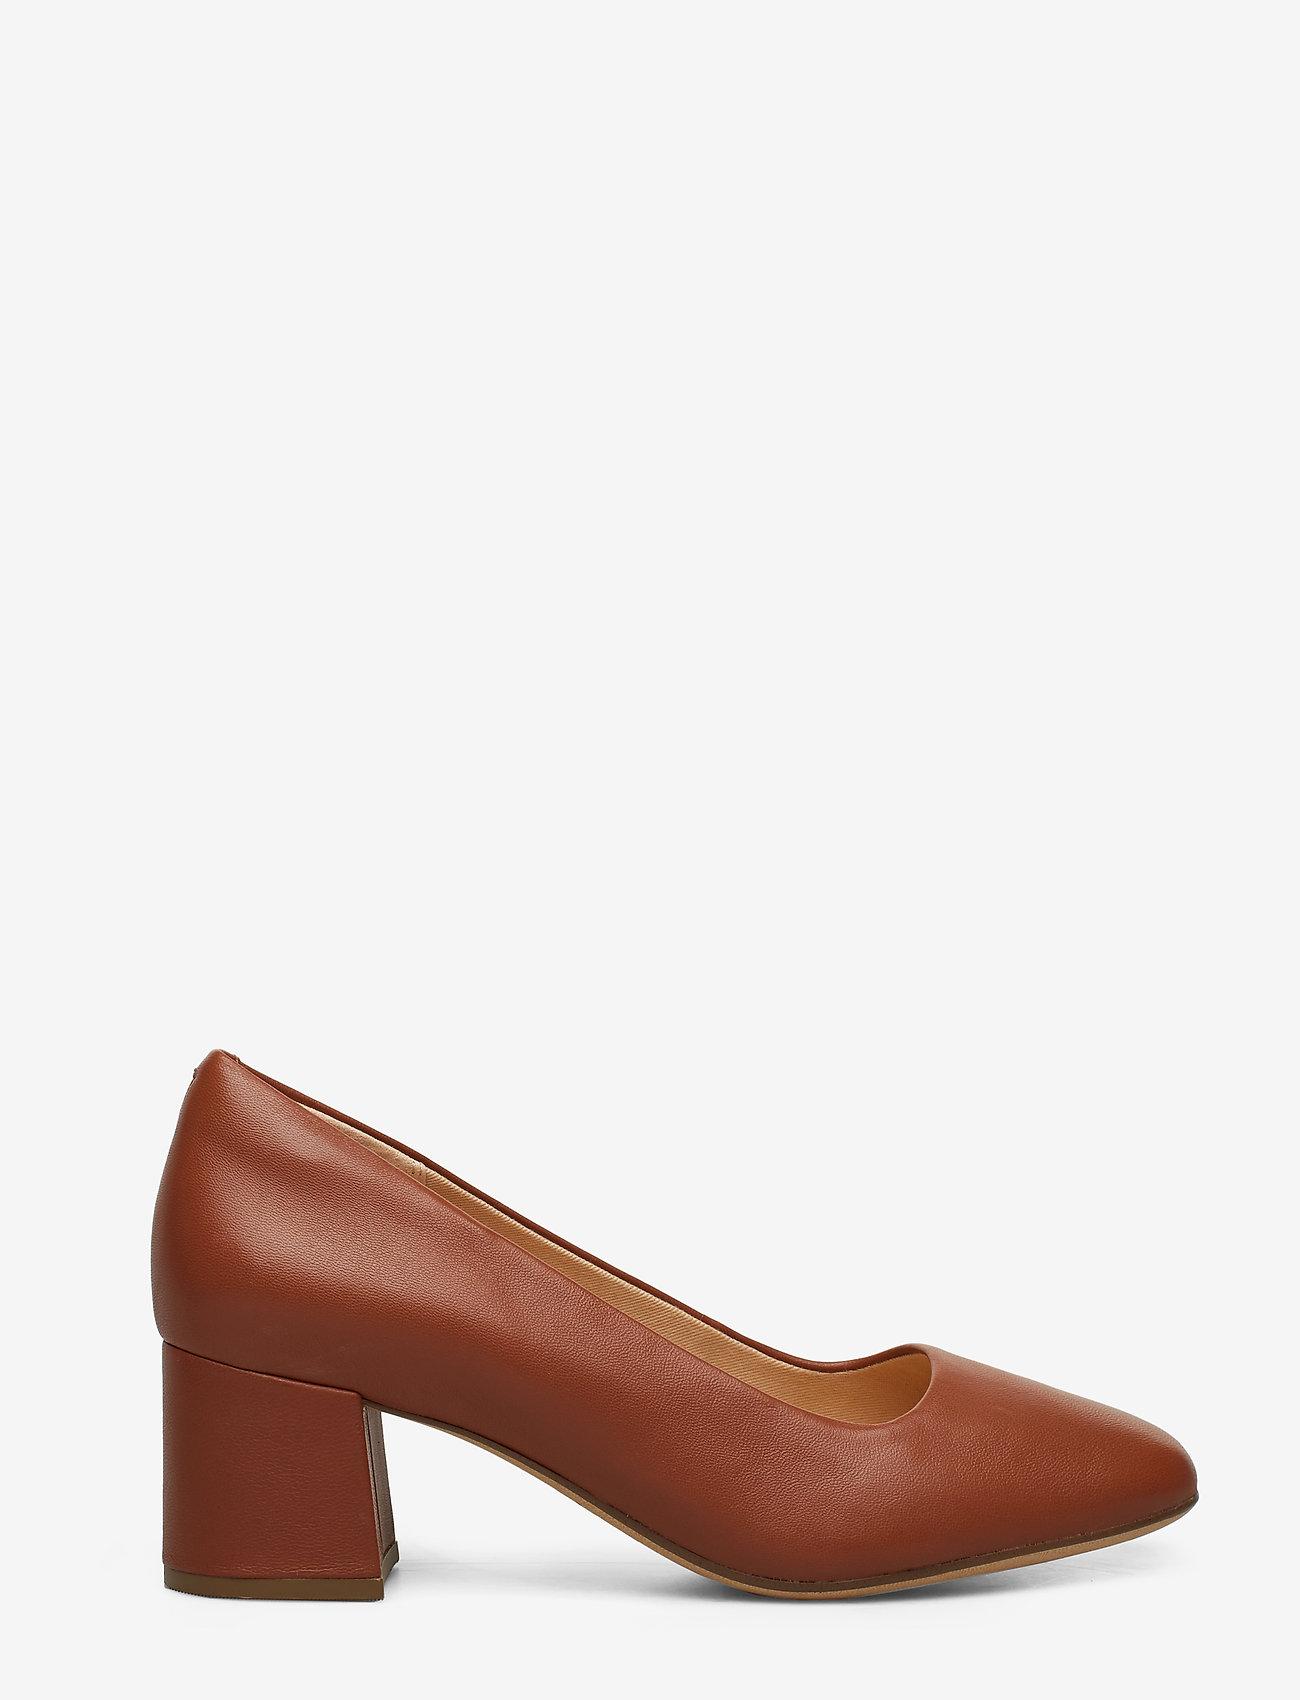 Clarks - Sheer Rose - escarpins classiques - tan leather - 1